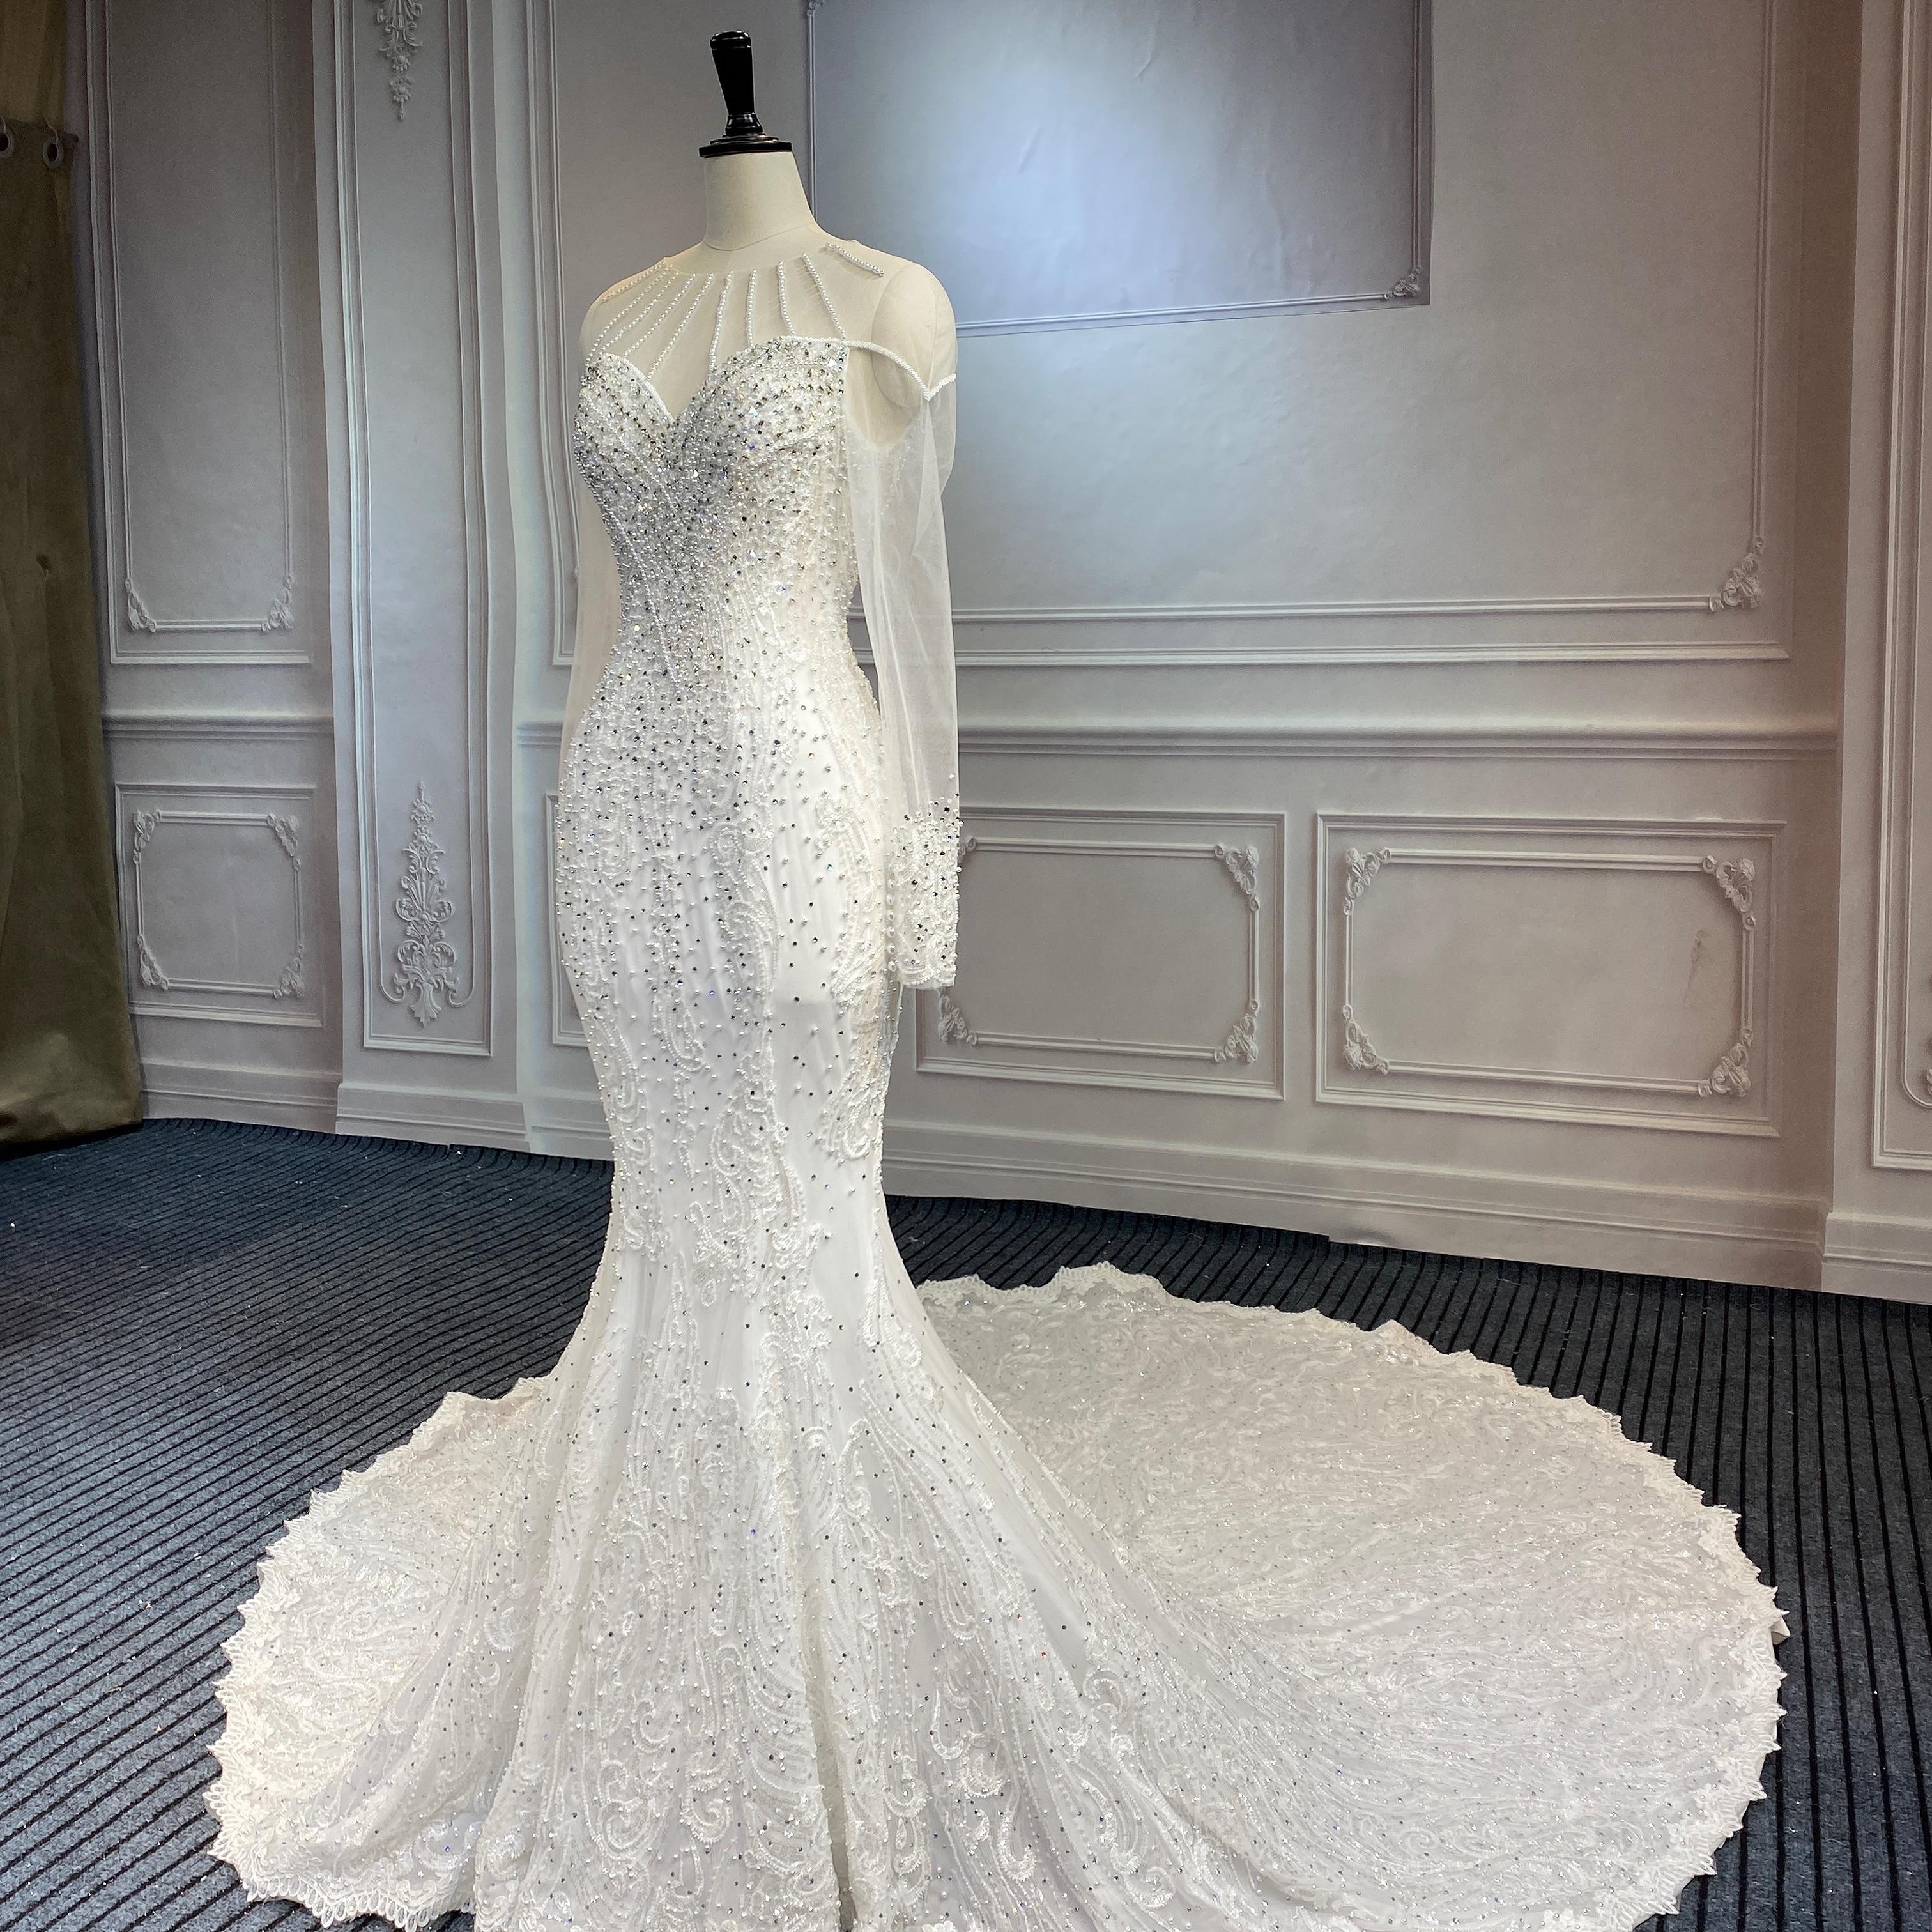 Marnham New Design Full Beads and Diamonds Mermaid Wedding Dress Bridal Dresses